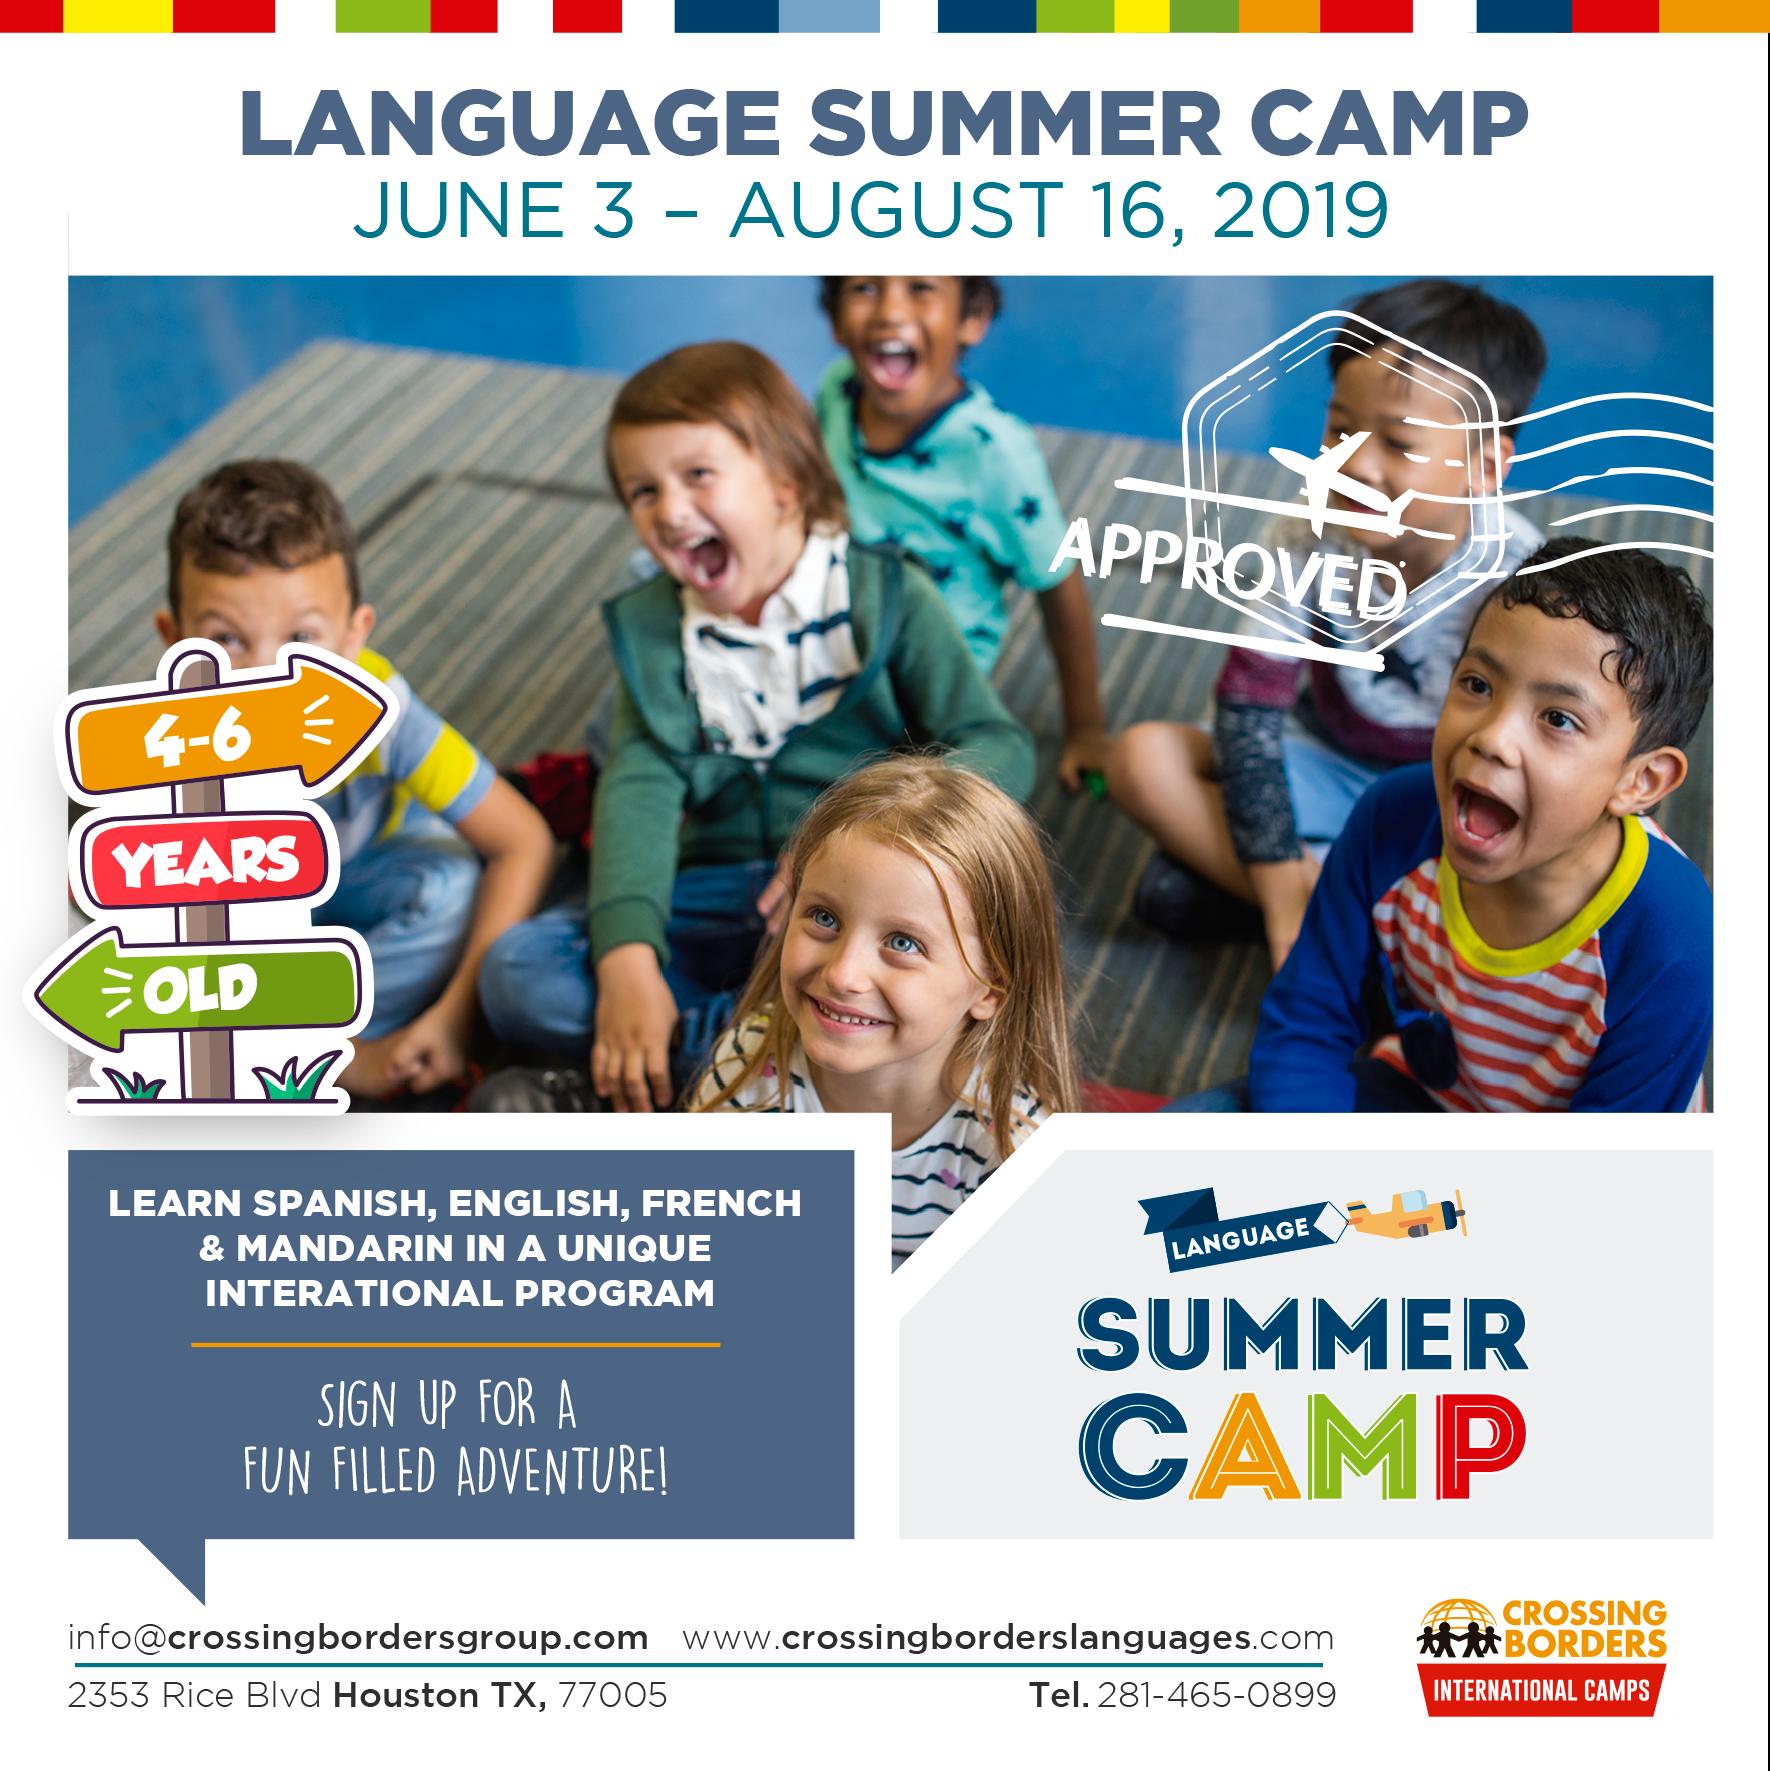 Ages 4-6 Language Camp